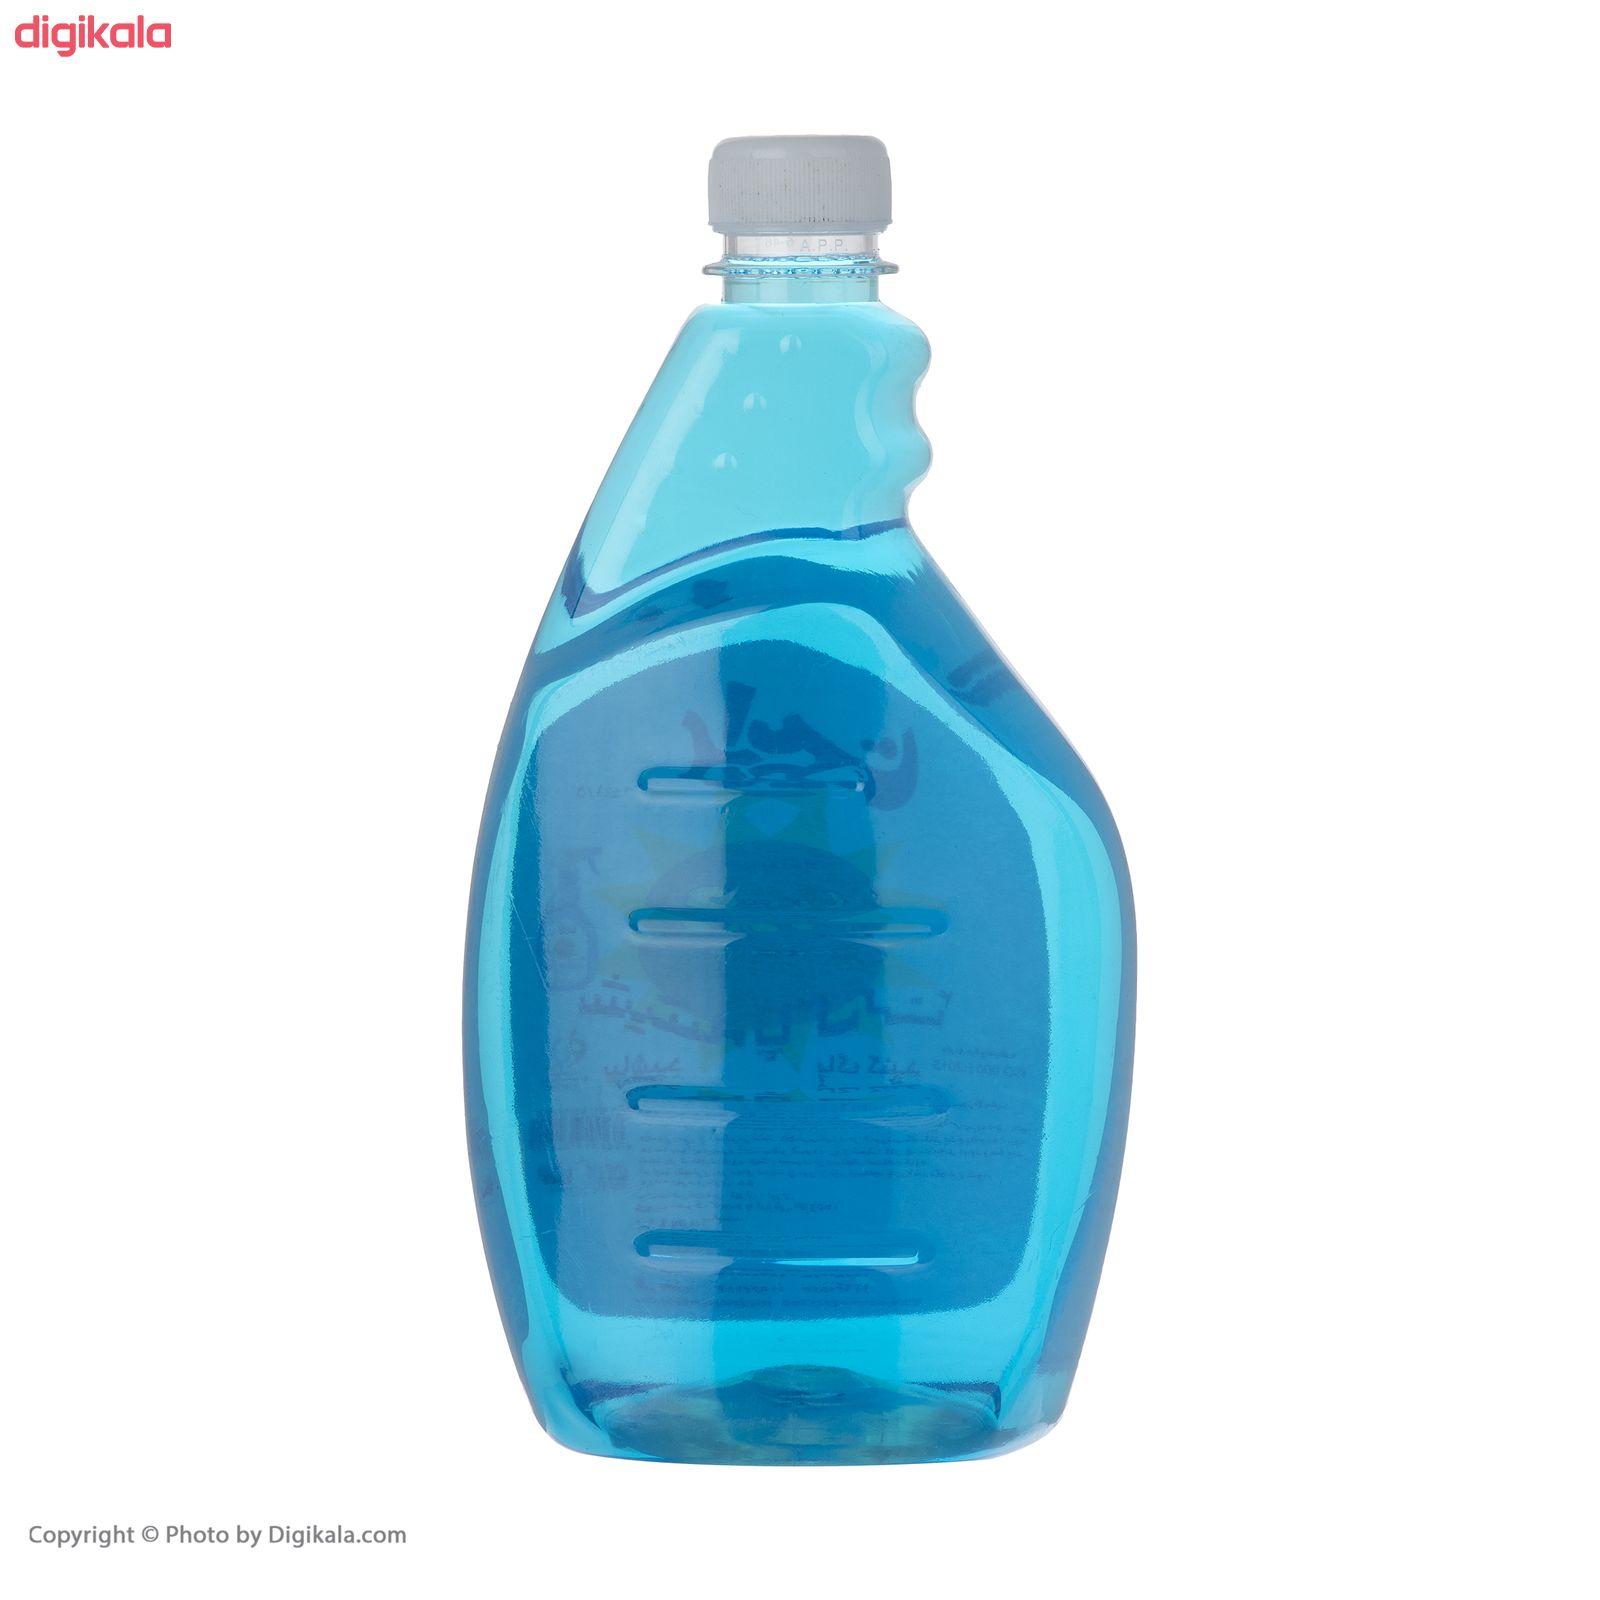 شیشه پاک کن من کد 01 حجم 1 لیتر مجموعه 2 عددی  main 1 16